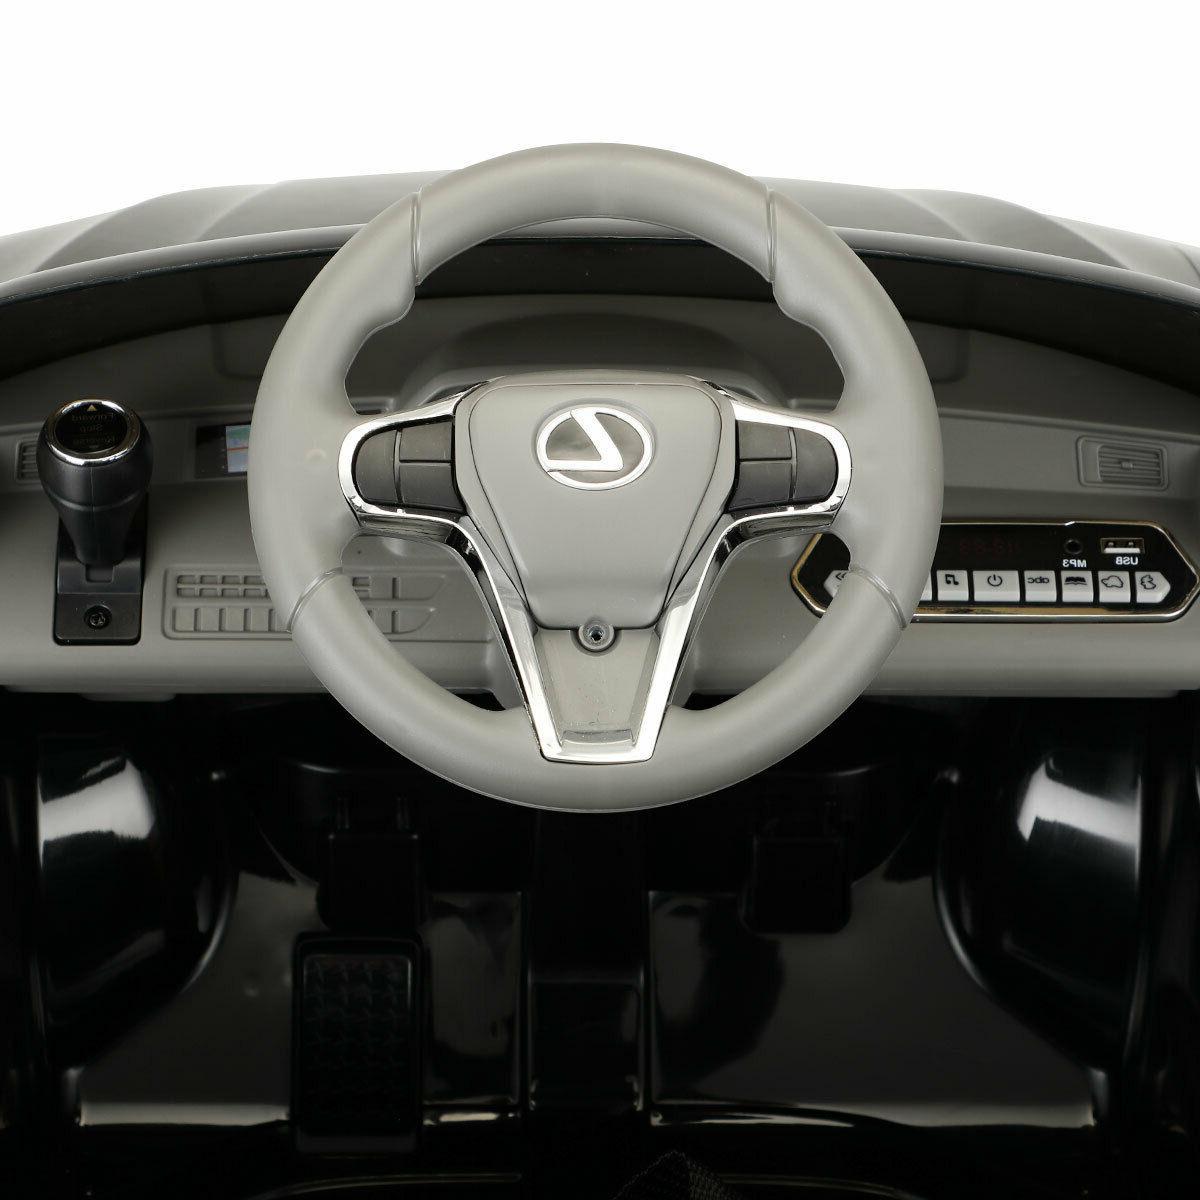 Electric Kids On Lexus Vehicle Black